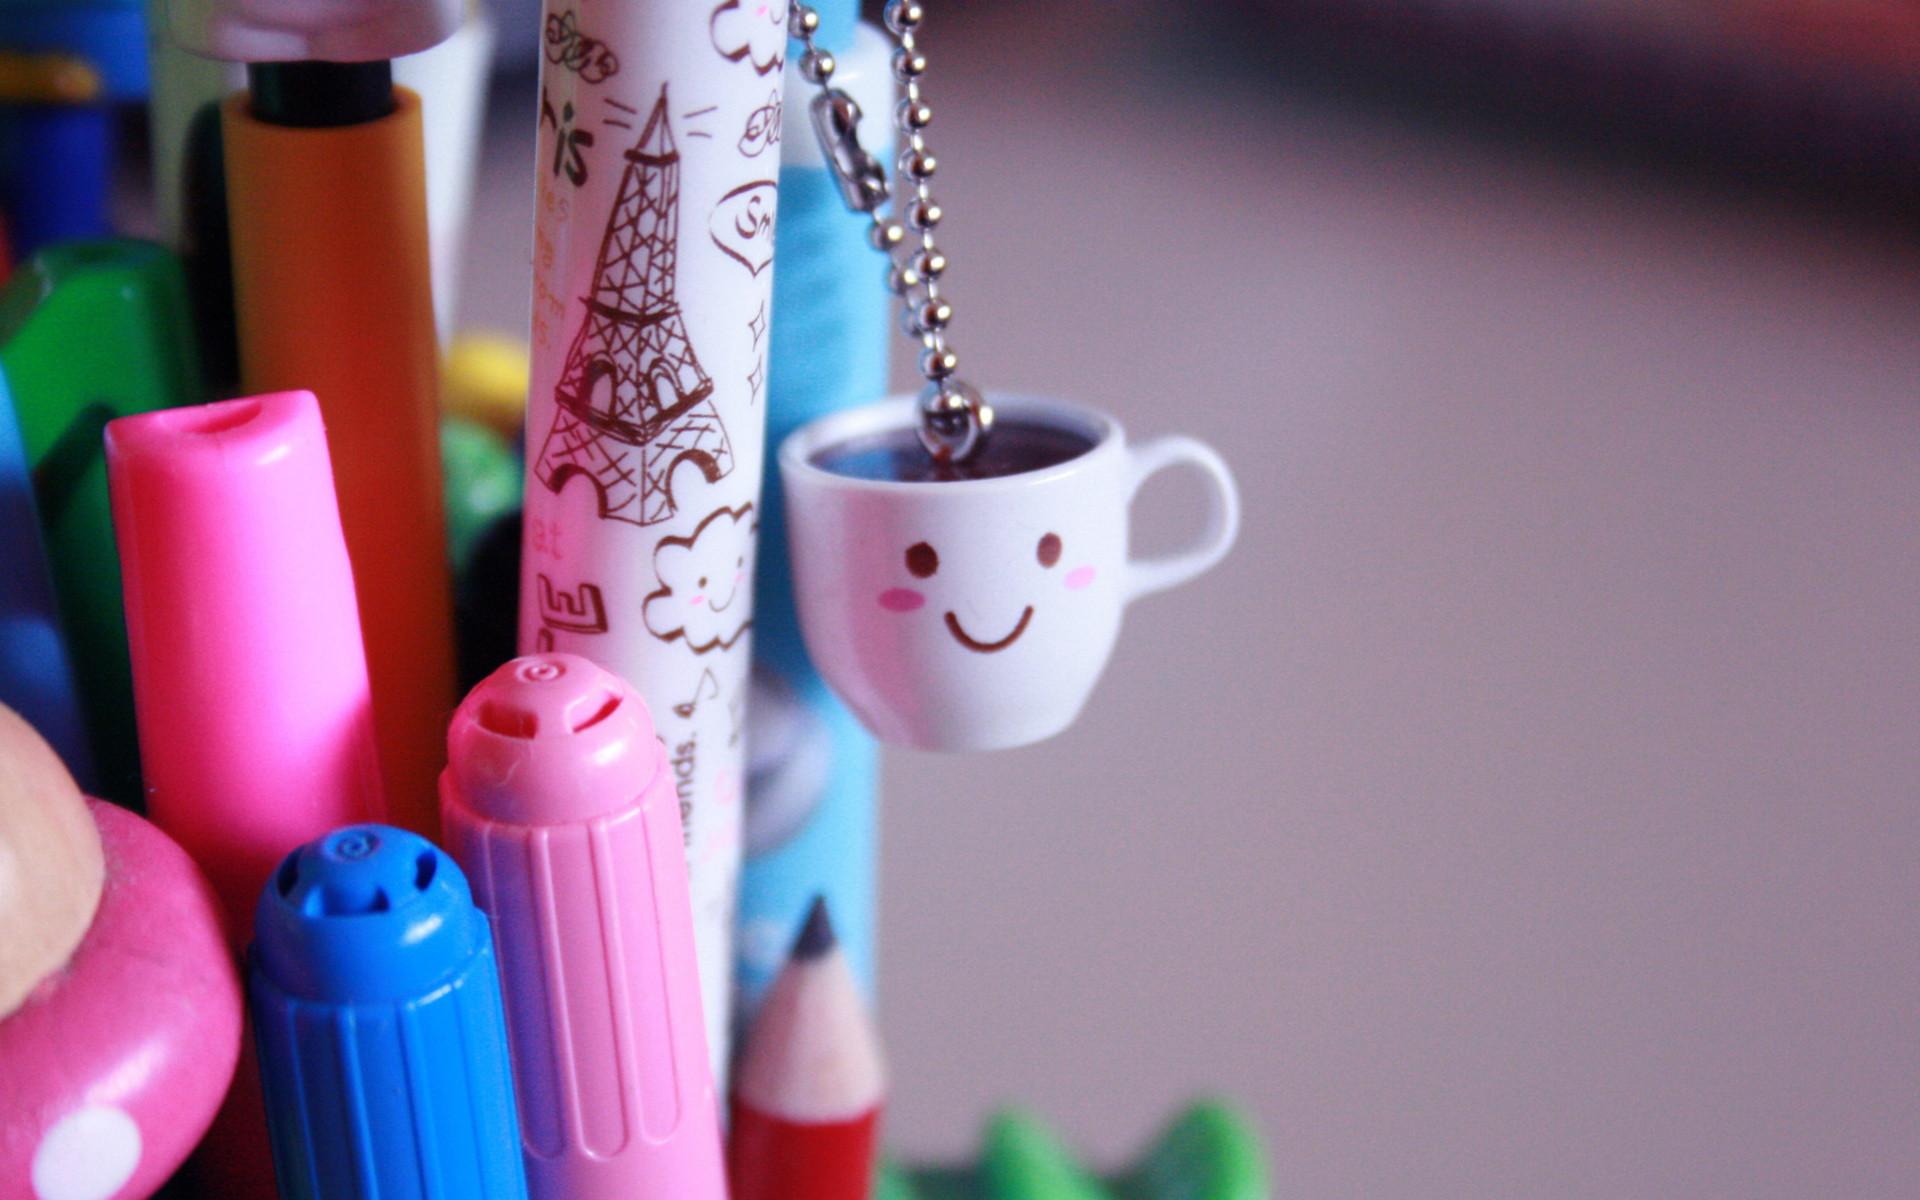 cute wallpaper for desktop ·①